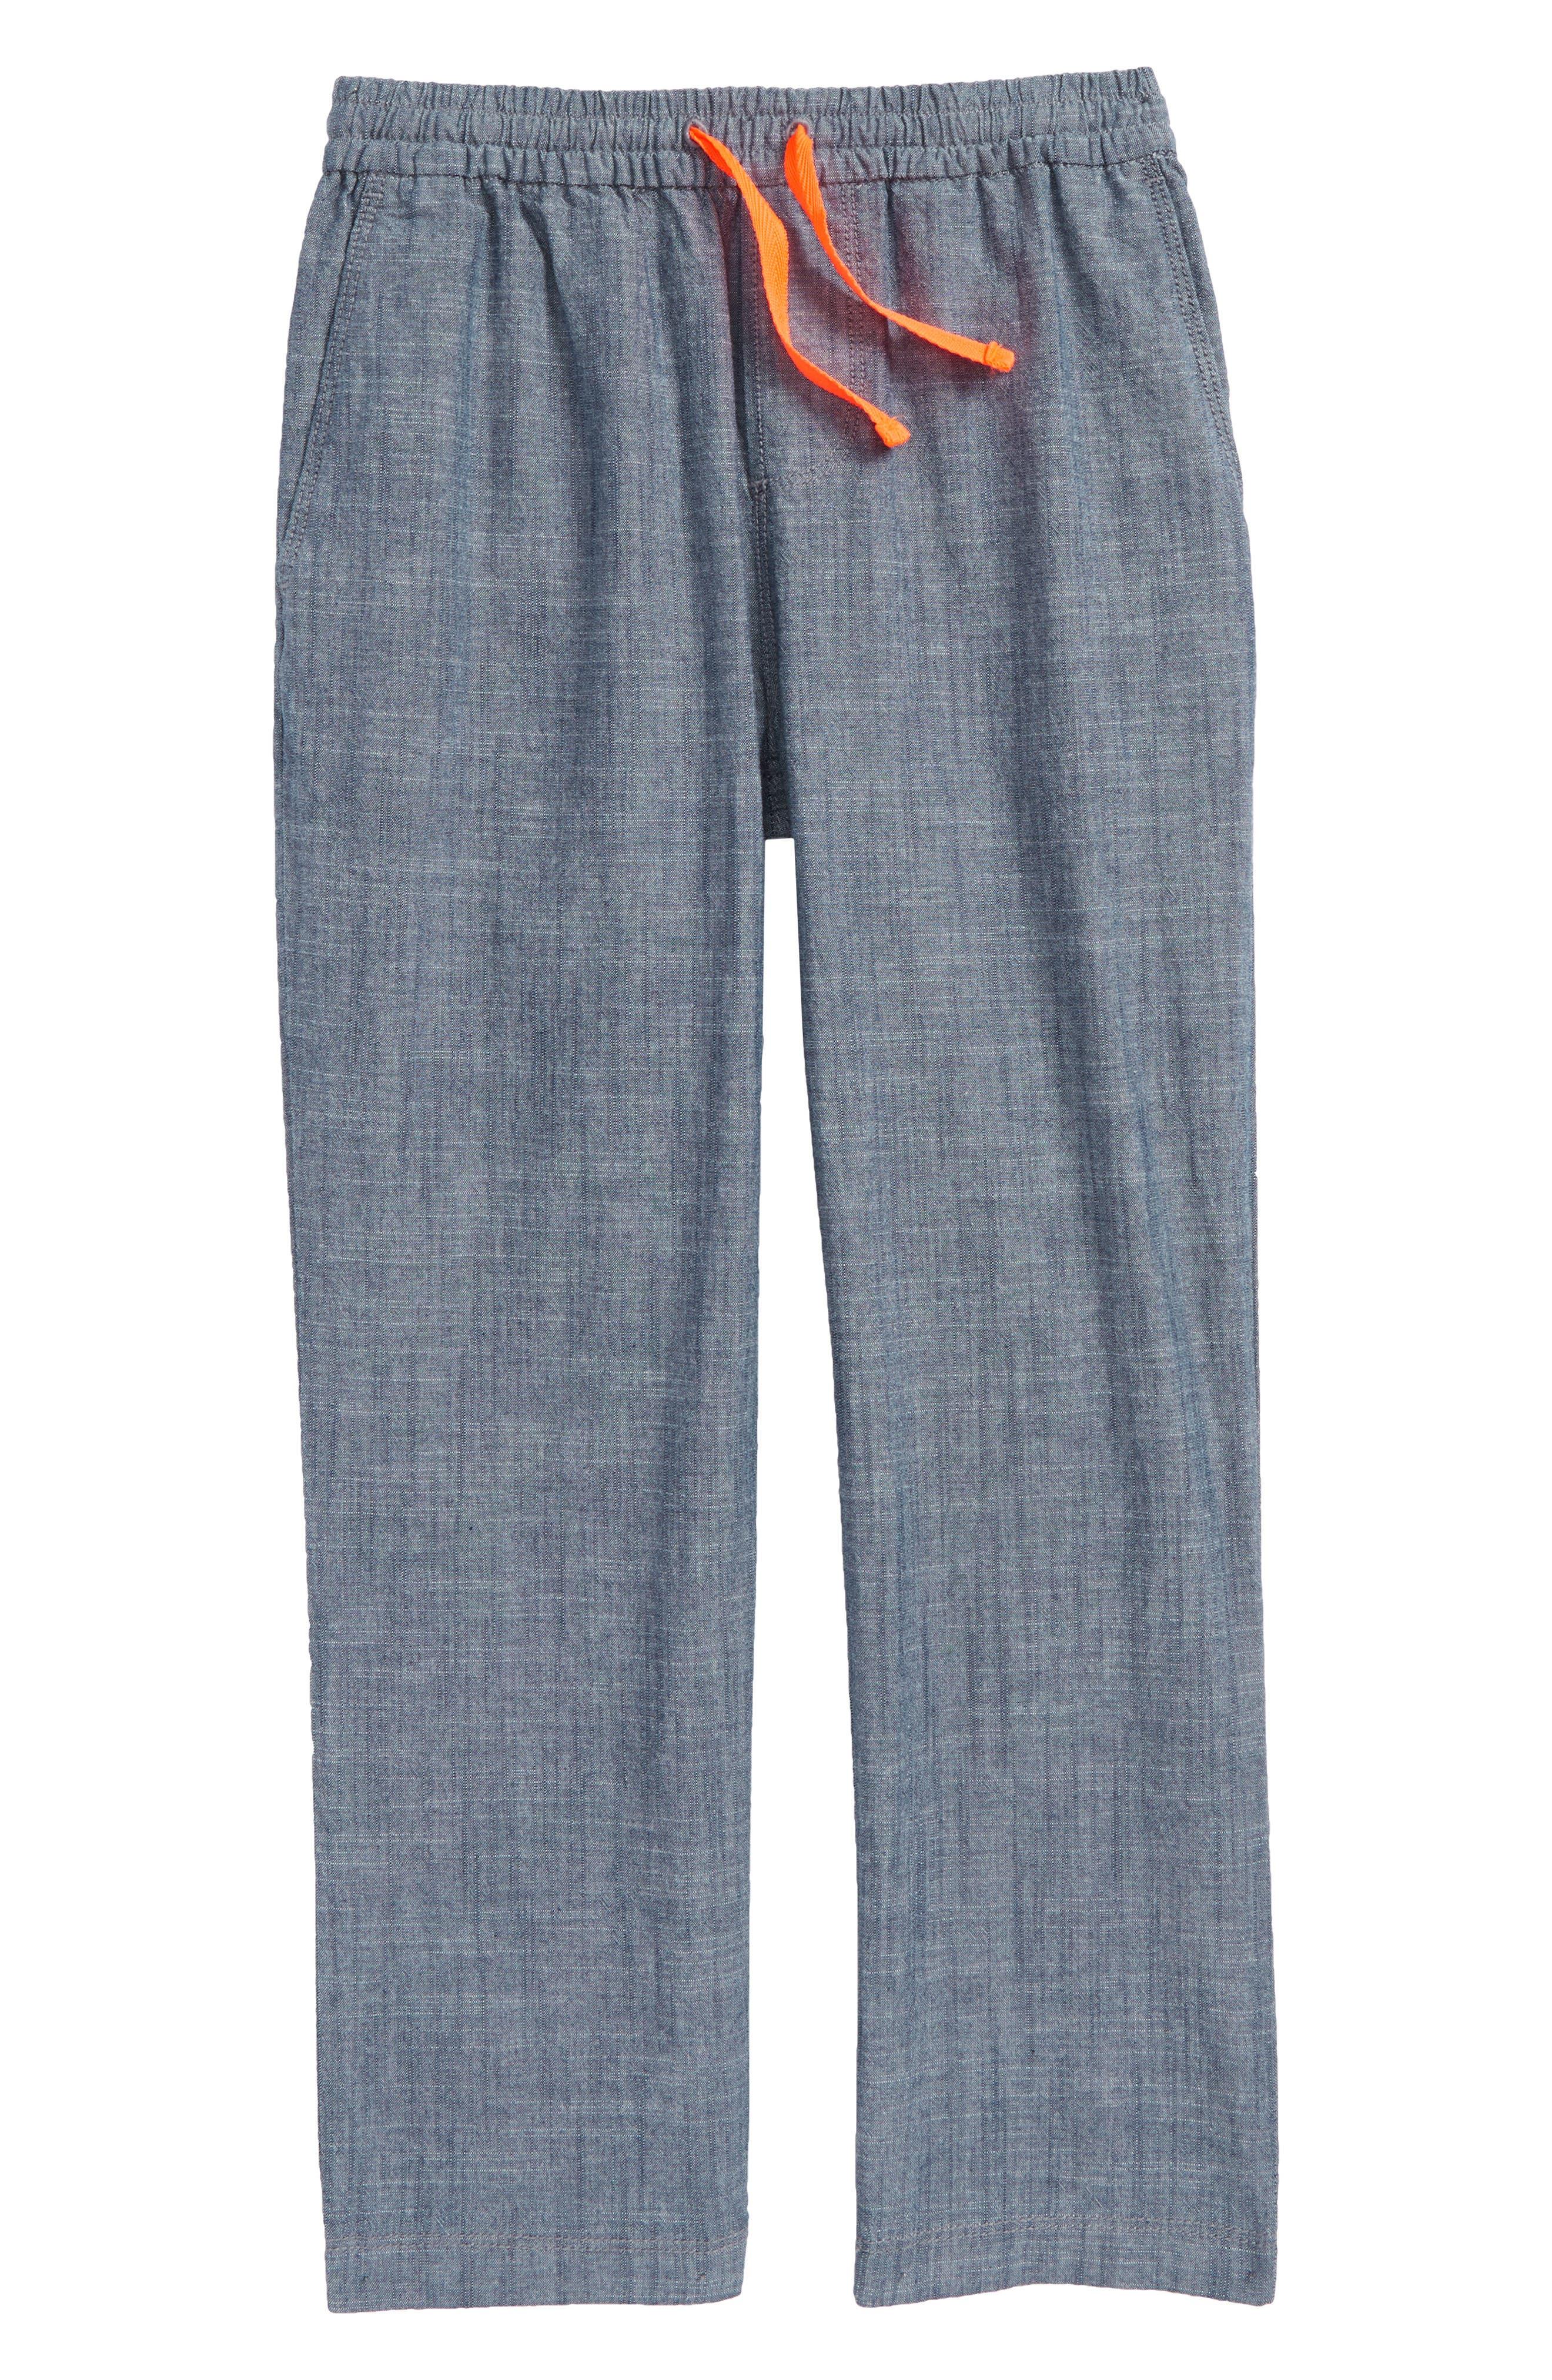 Summer Pull-On Pants,                         Main,                         color, Mid Indigo Chambray